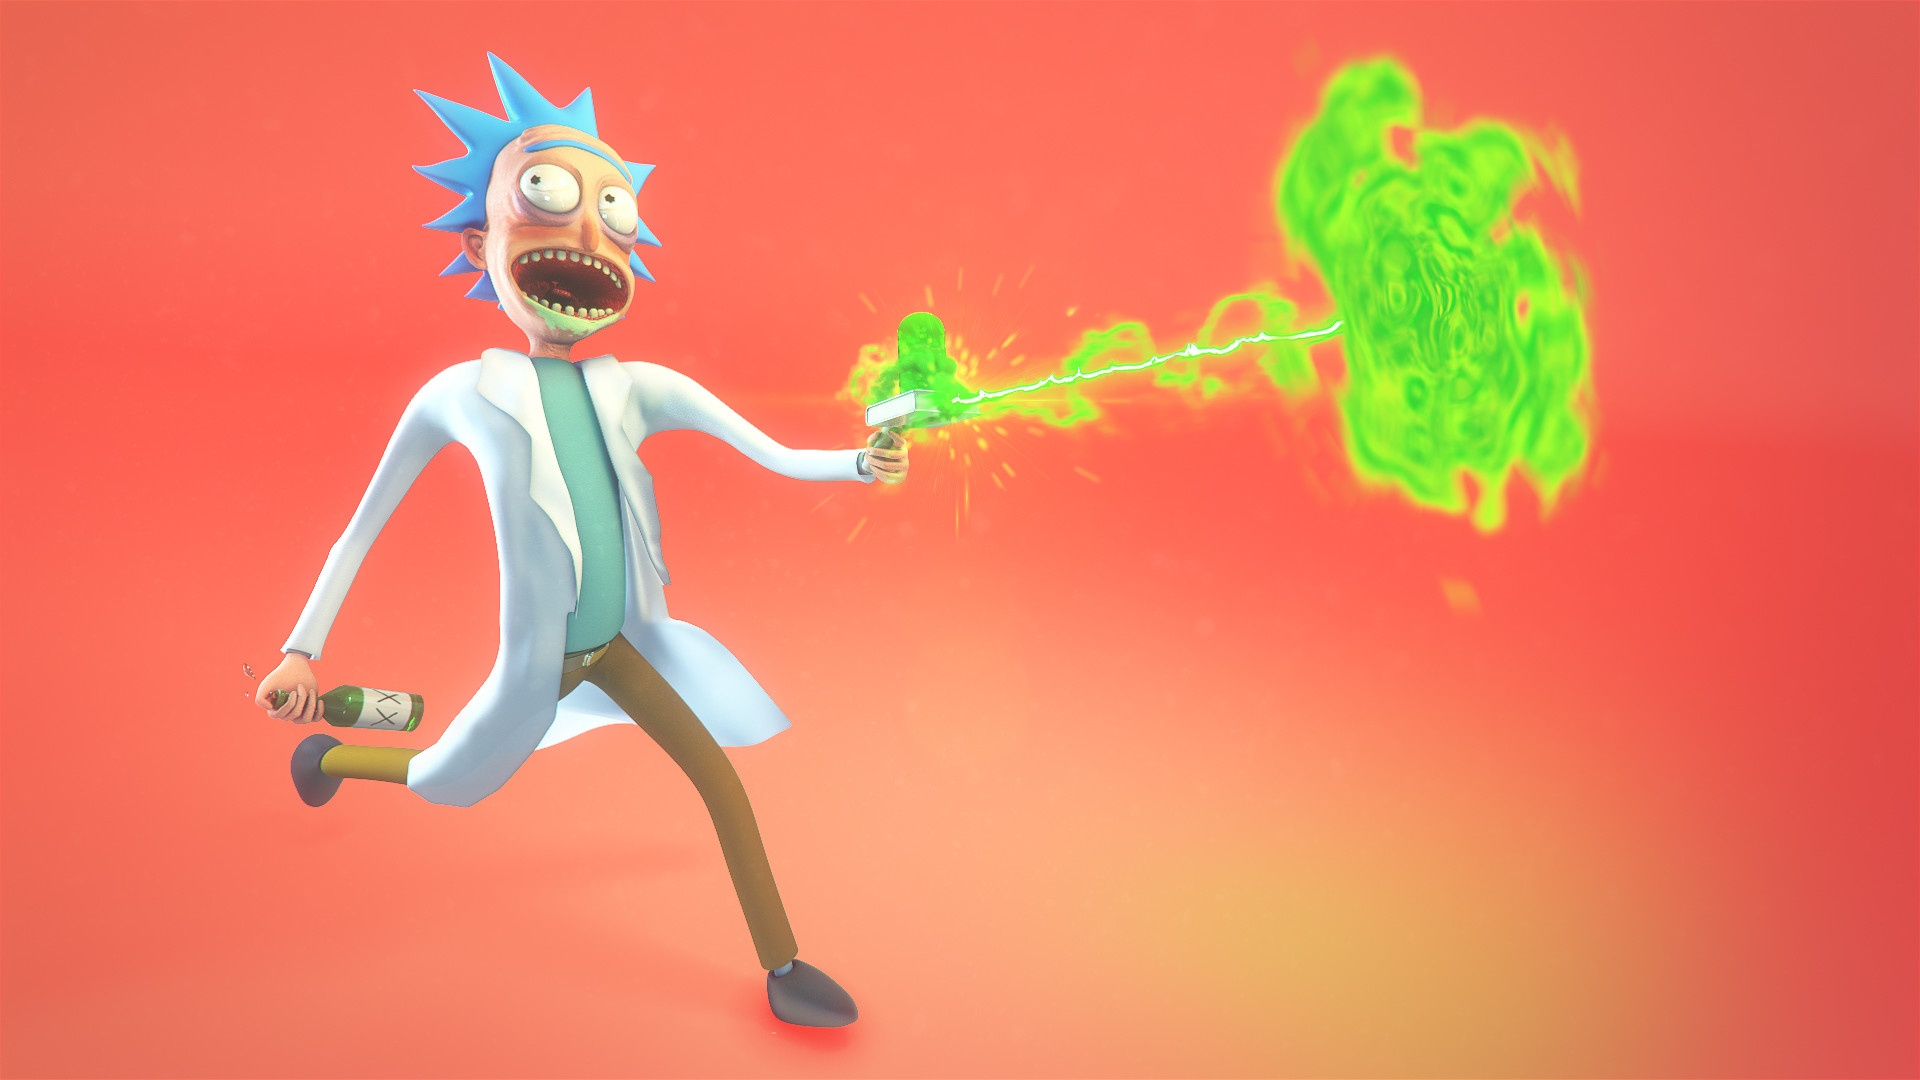 Rick And Morty Art desktop wallpaper